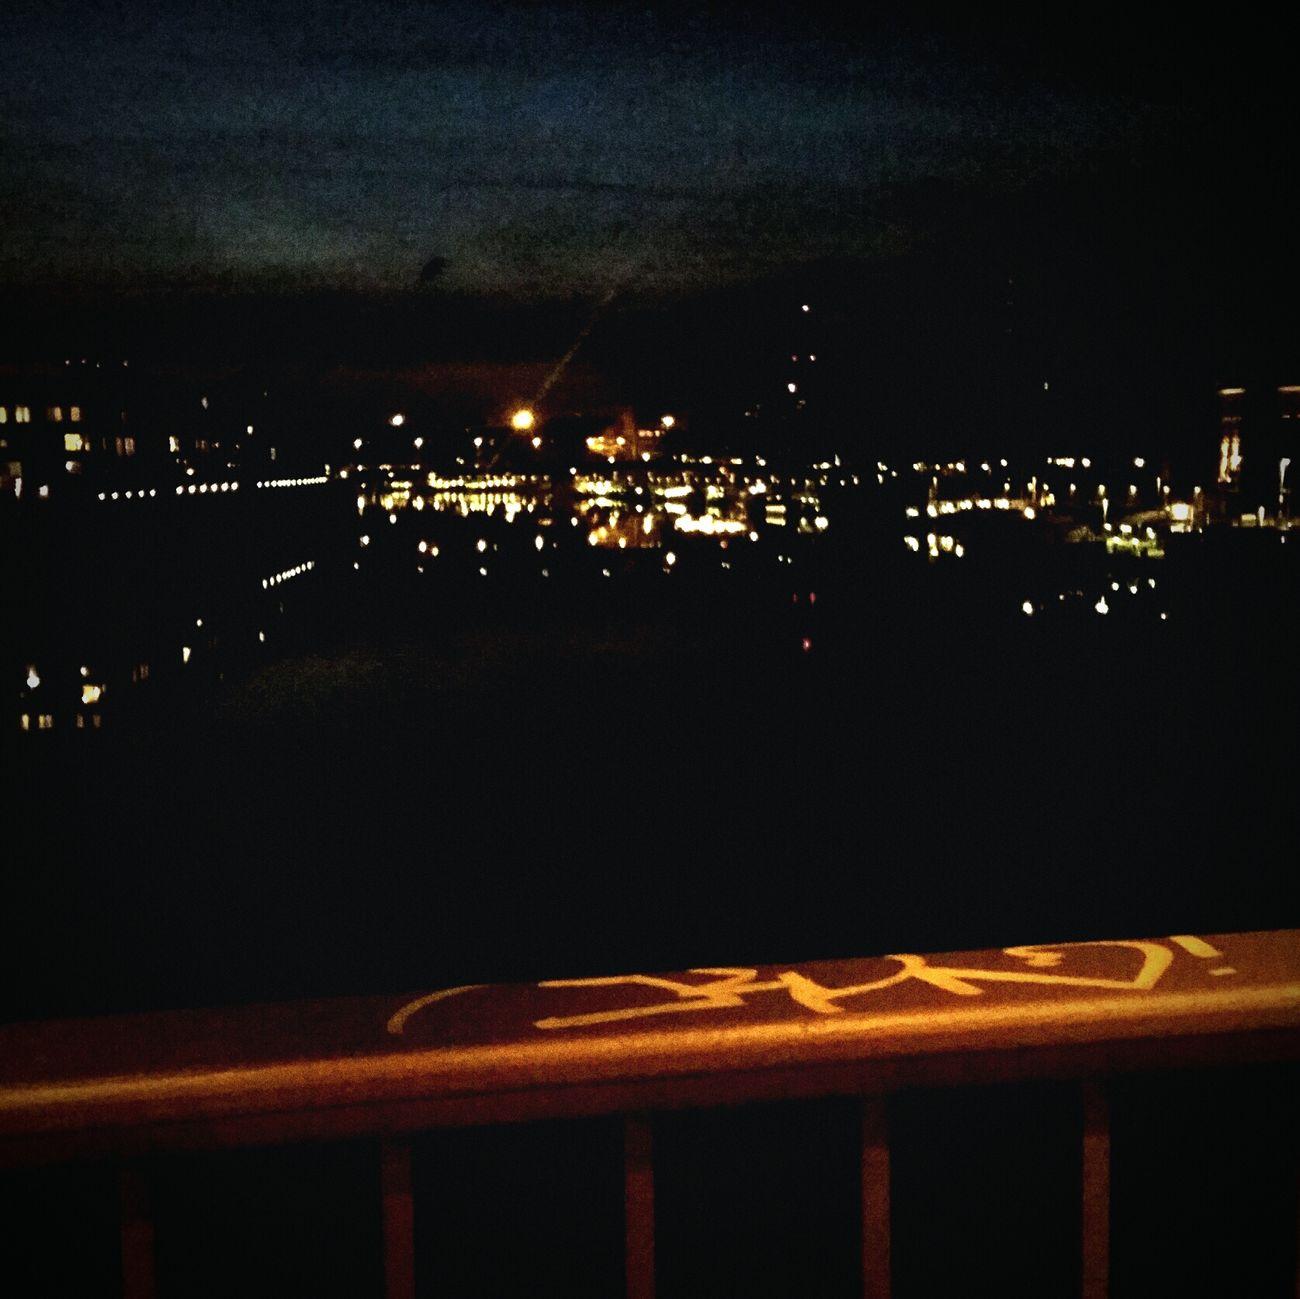 Bremen Bremen City Germany Nightphotography Wilhelmkaisenbrücke Weser Hansestadt